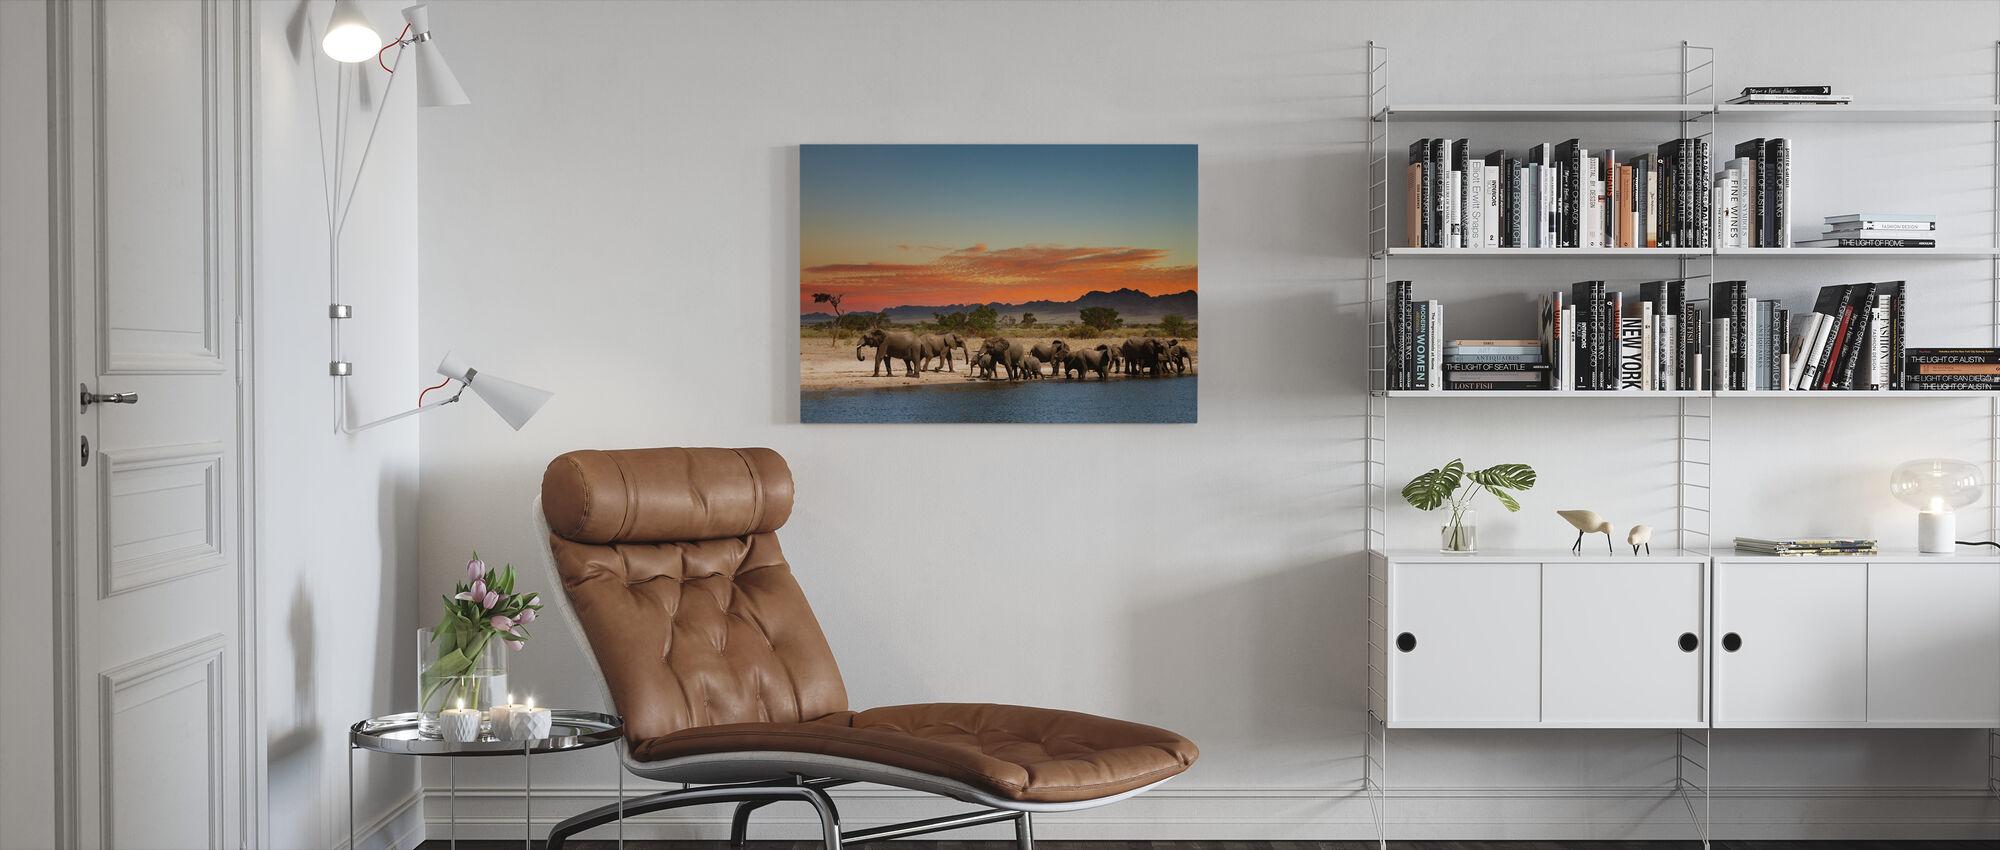 Herd of Elephants - Canvas print - Living Room